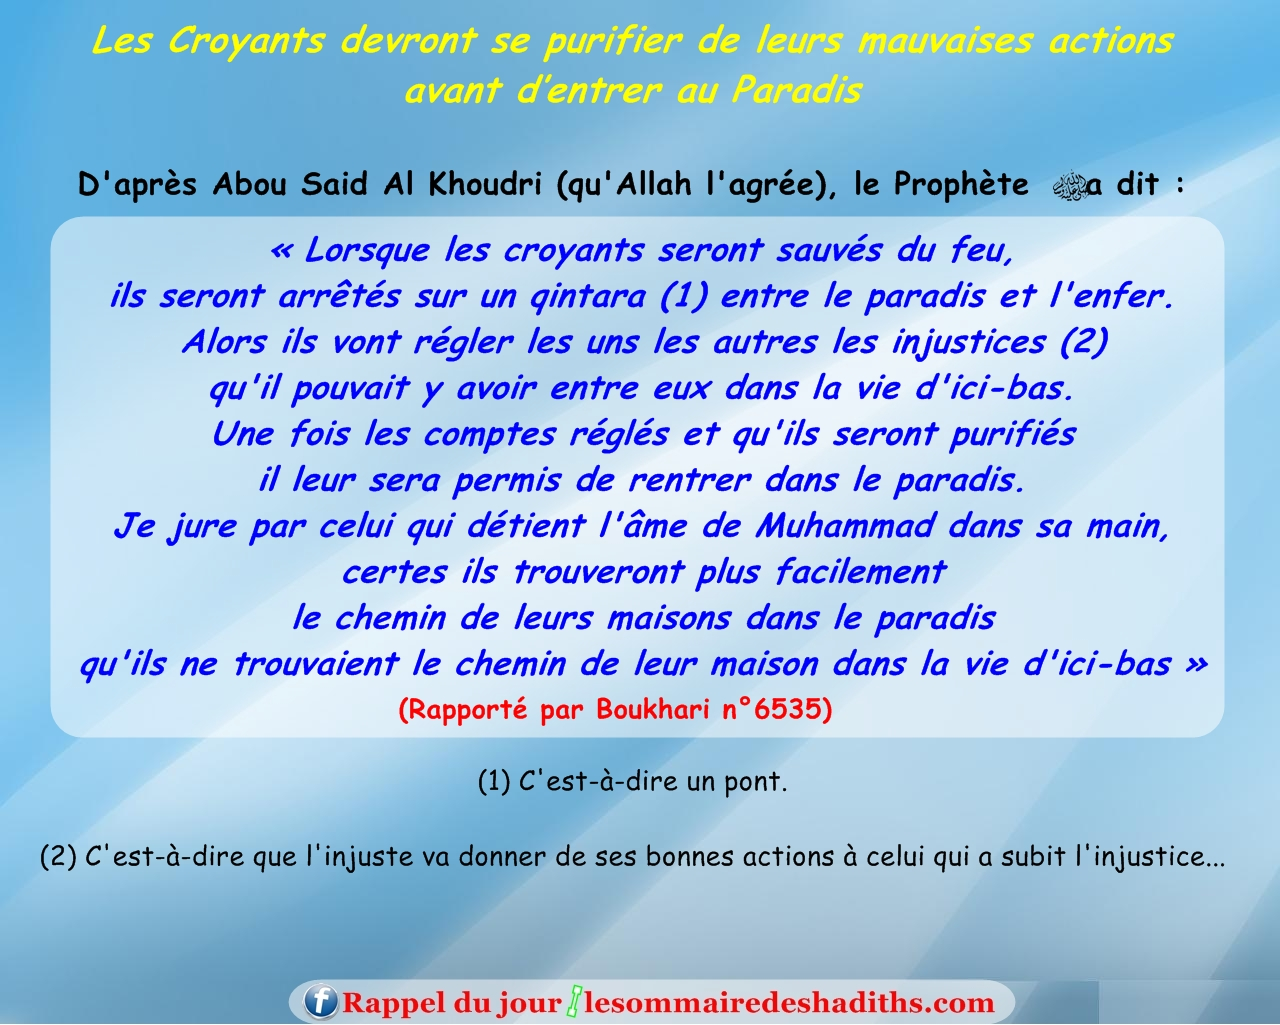 hadith Les Croyants devront se purifier de leurs mauvaises actions (Abu Sa'id Al-Khudri)